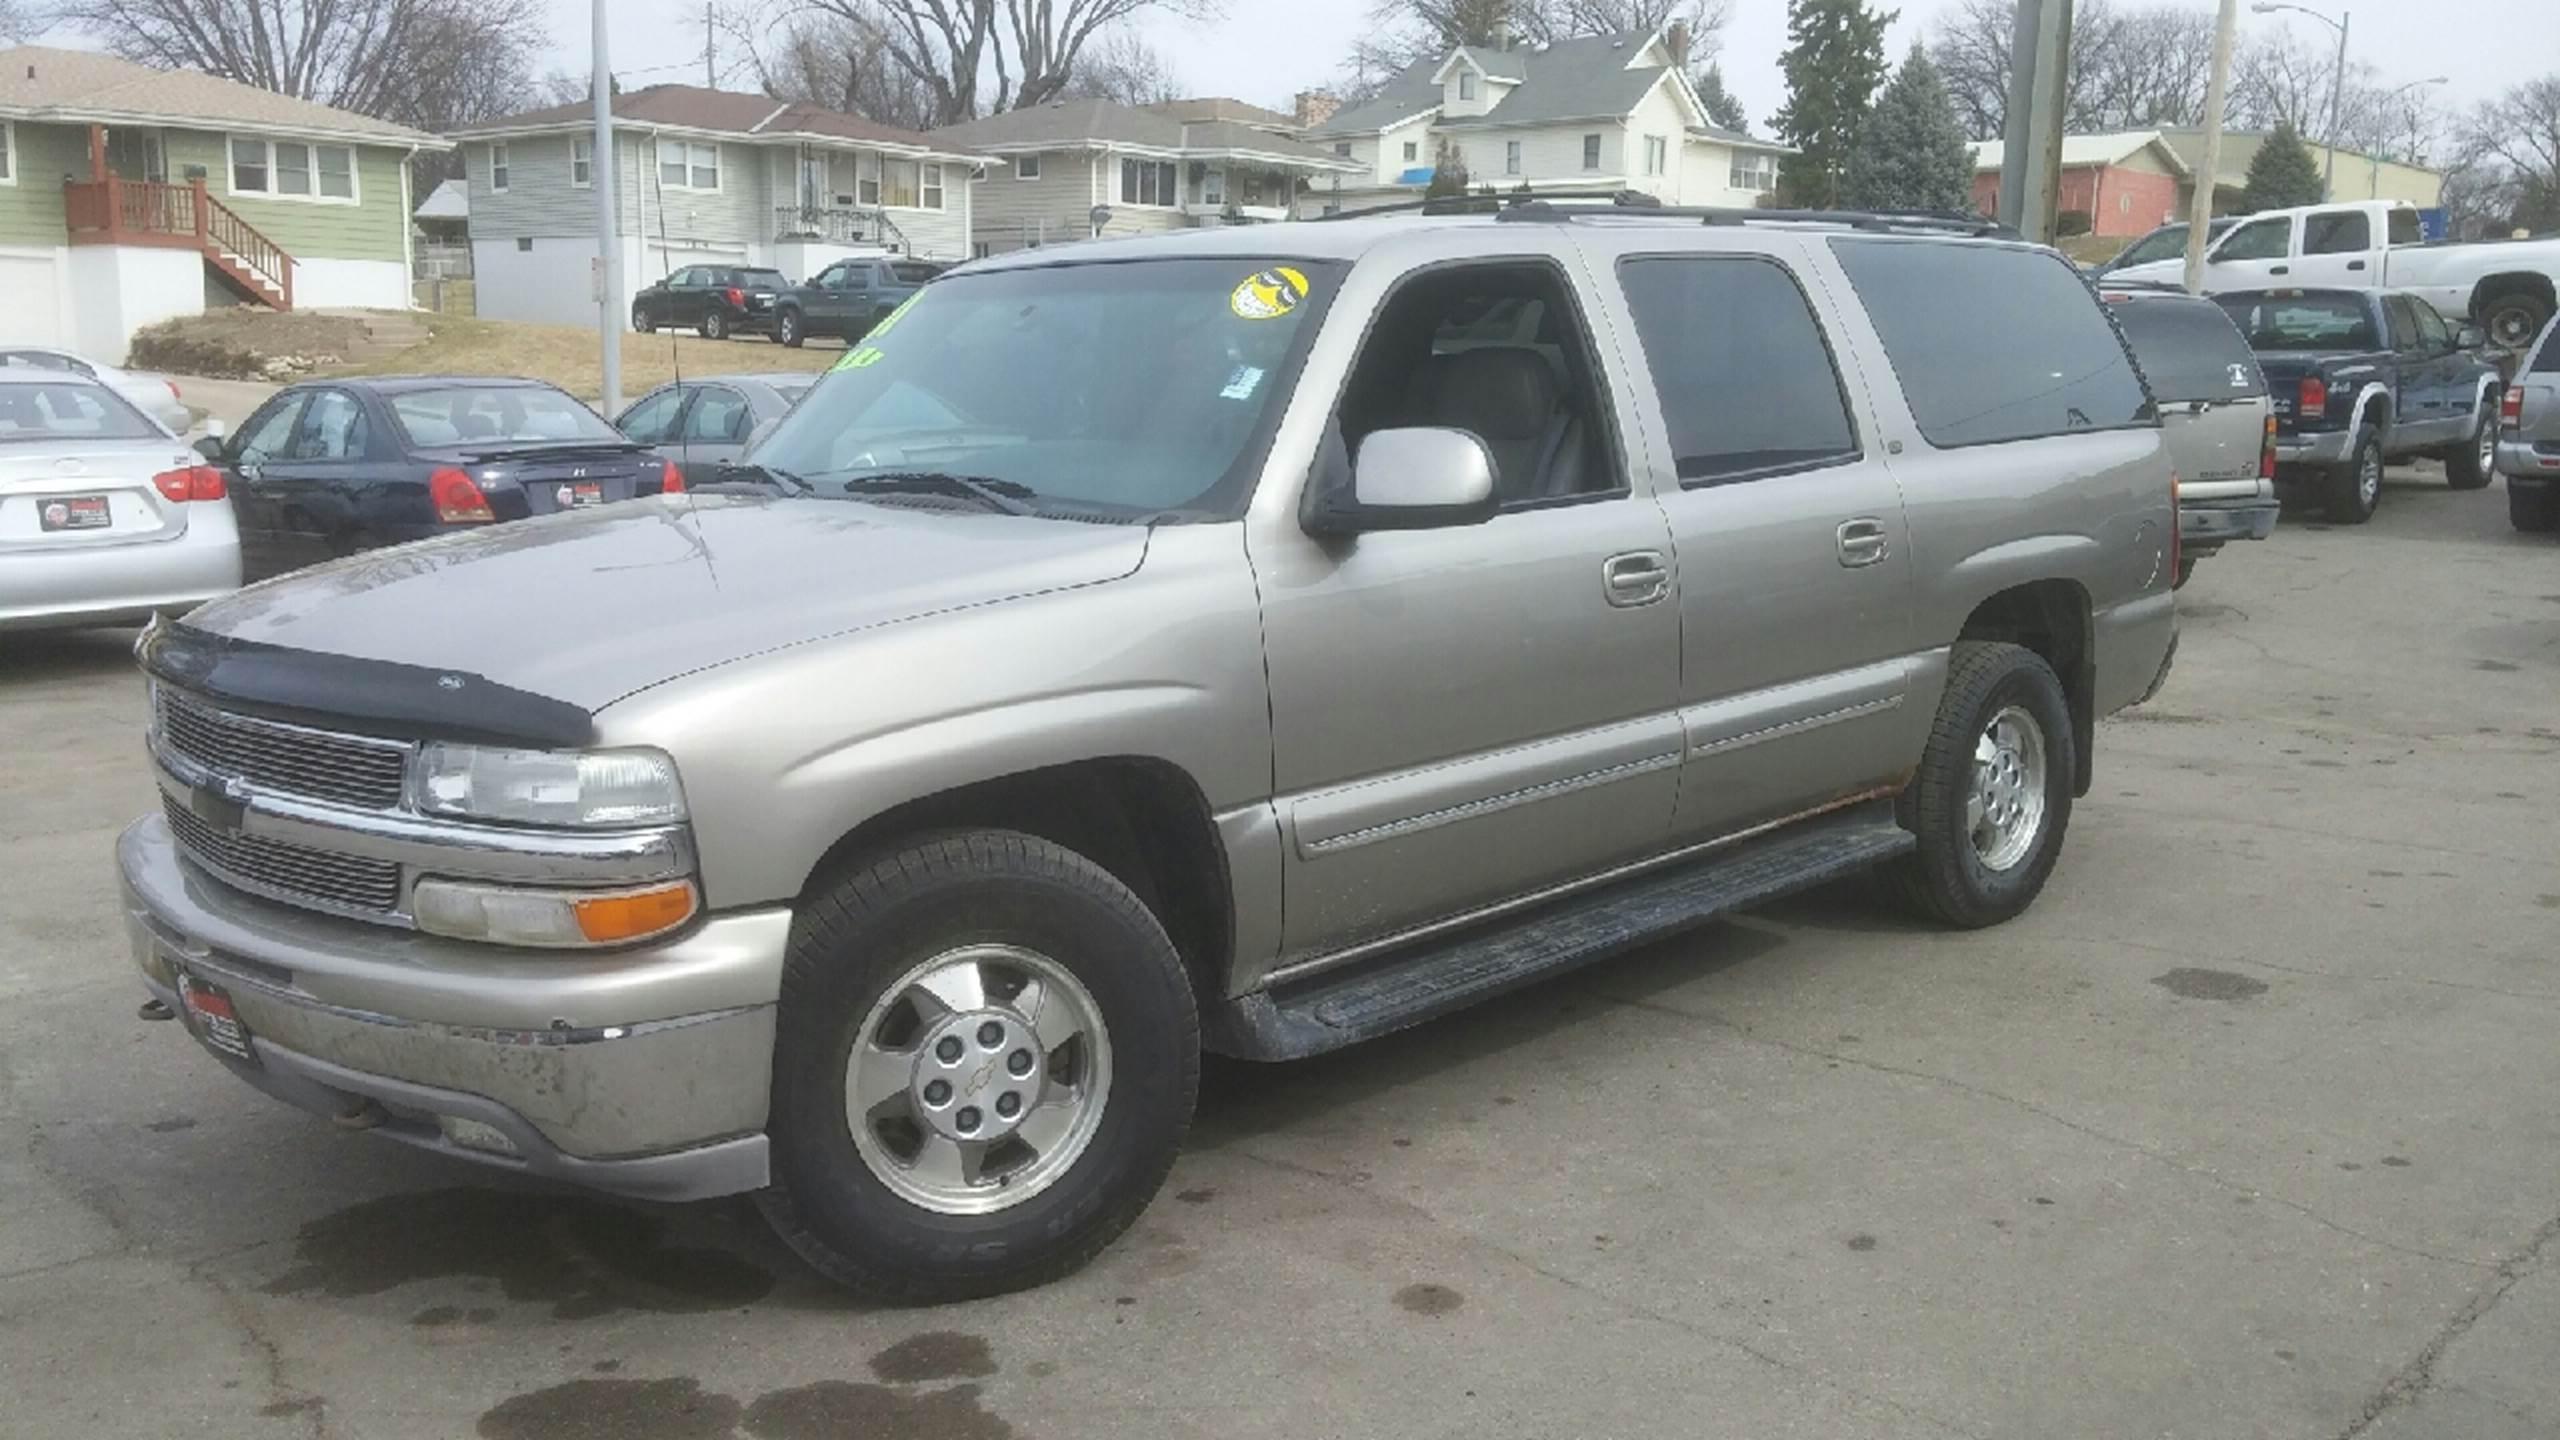 2001 Chevrolet Suburban for sale in Bellevue, NE